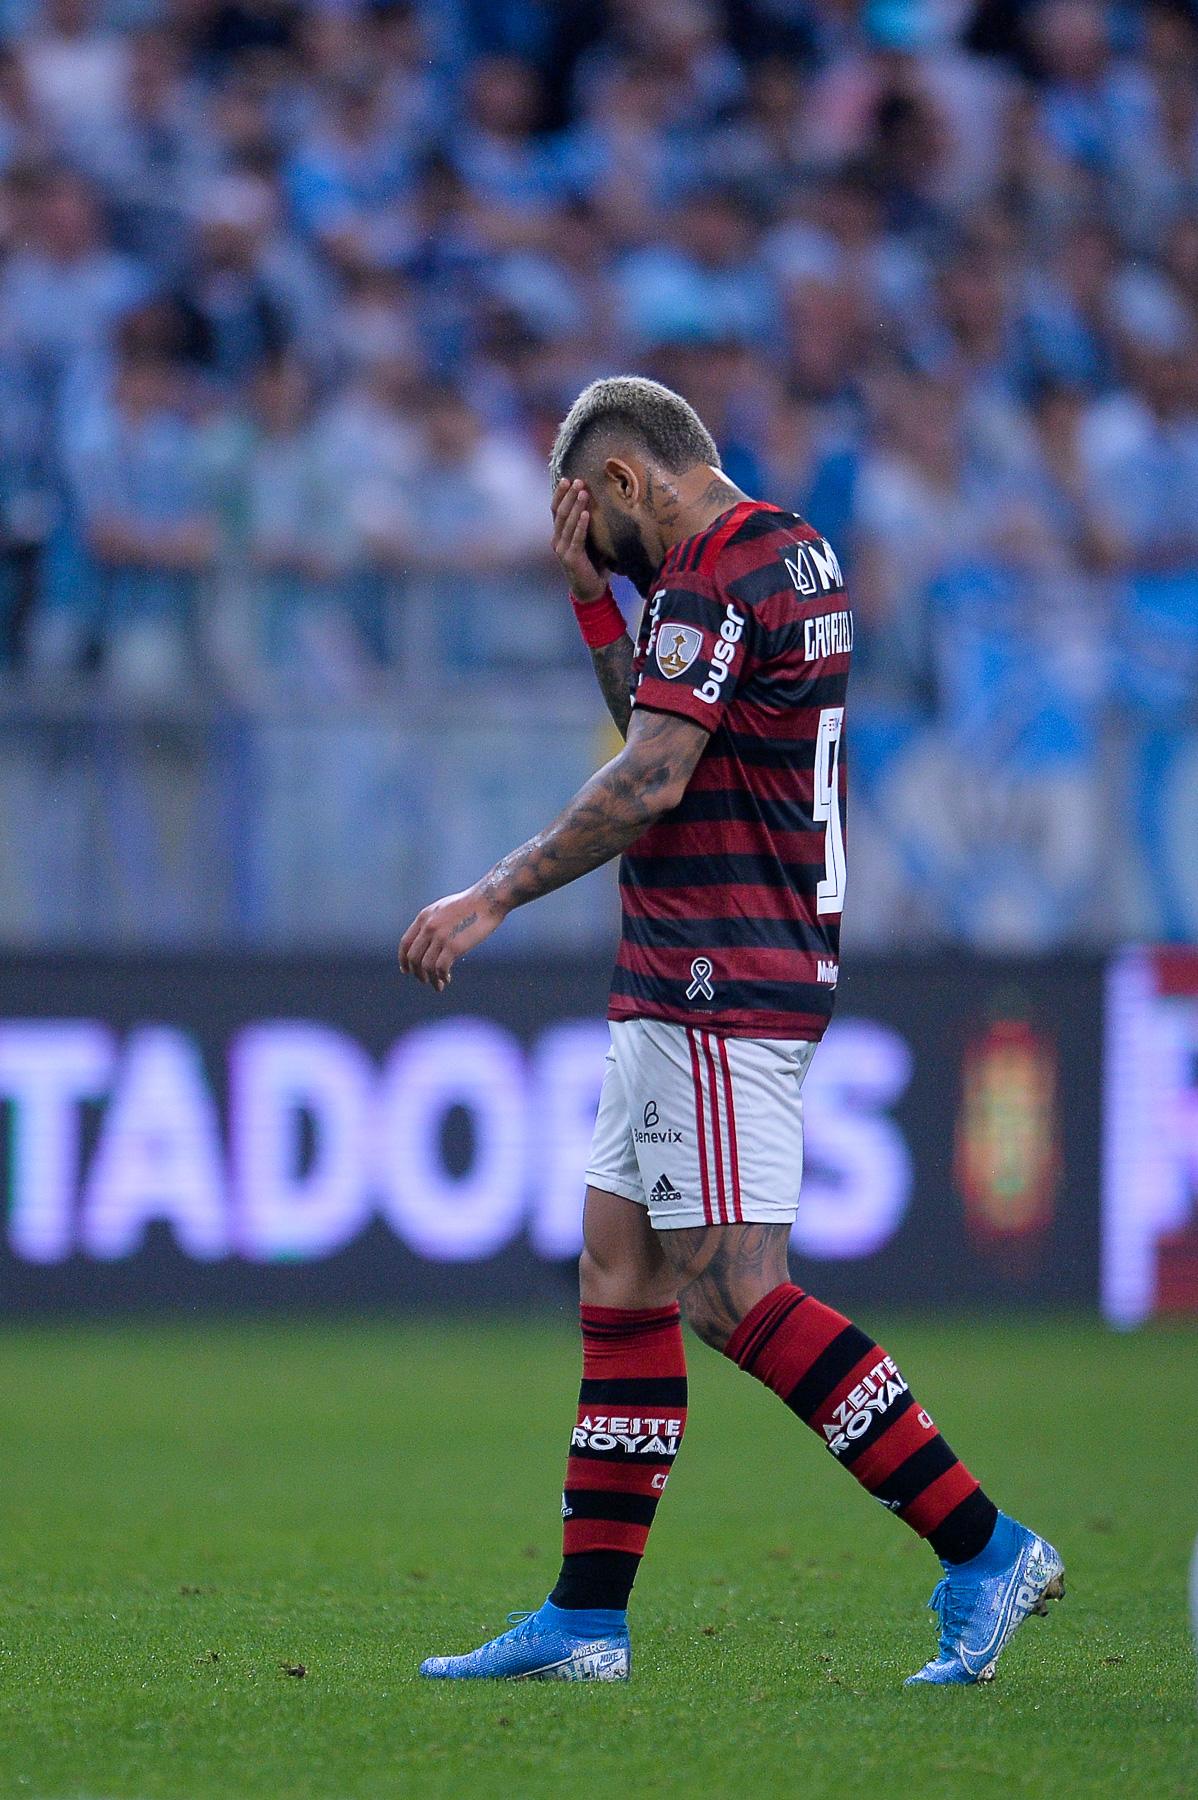 Gremio_X_Flamengo_dudabairros_Eleven_163